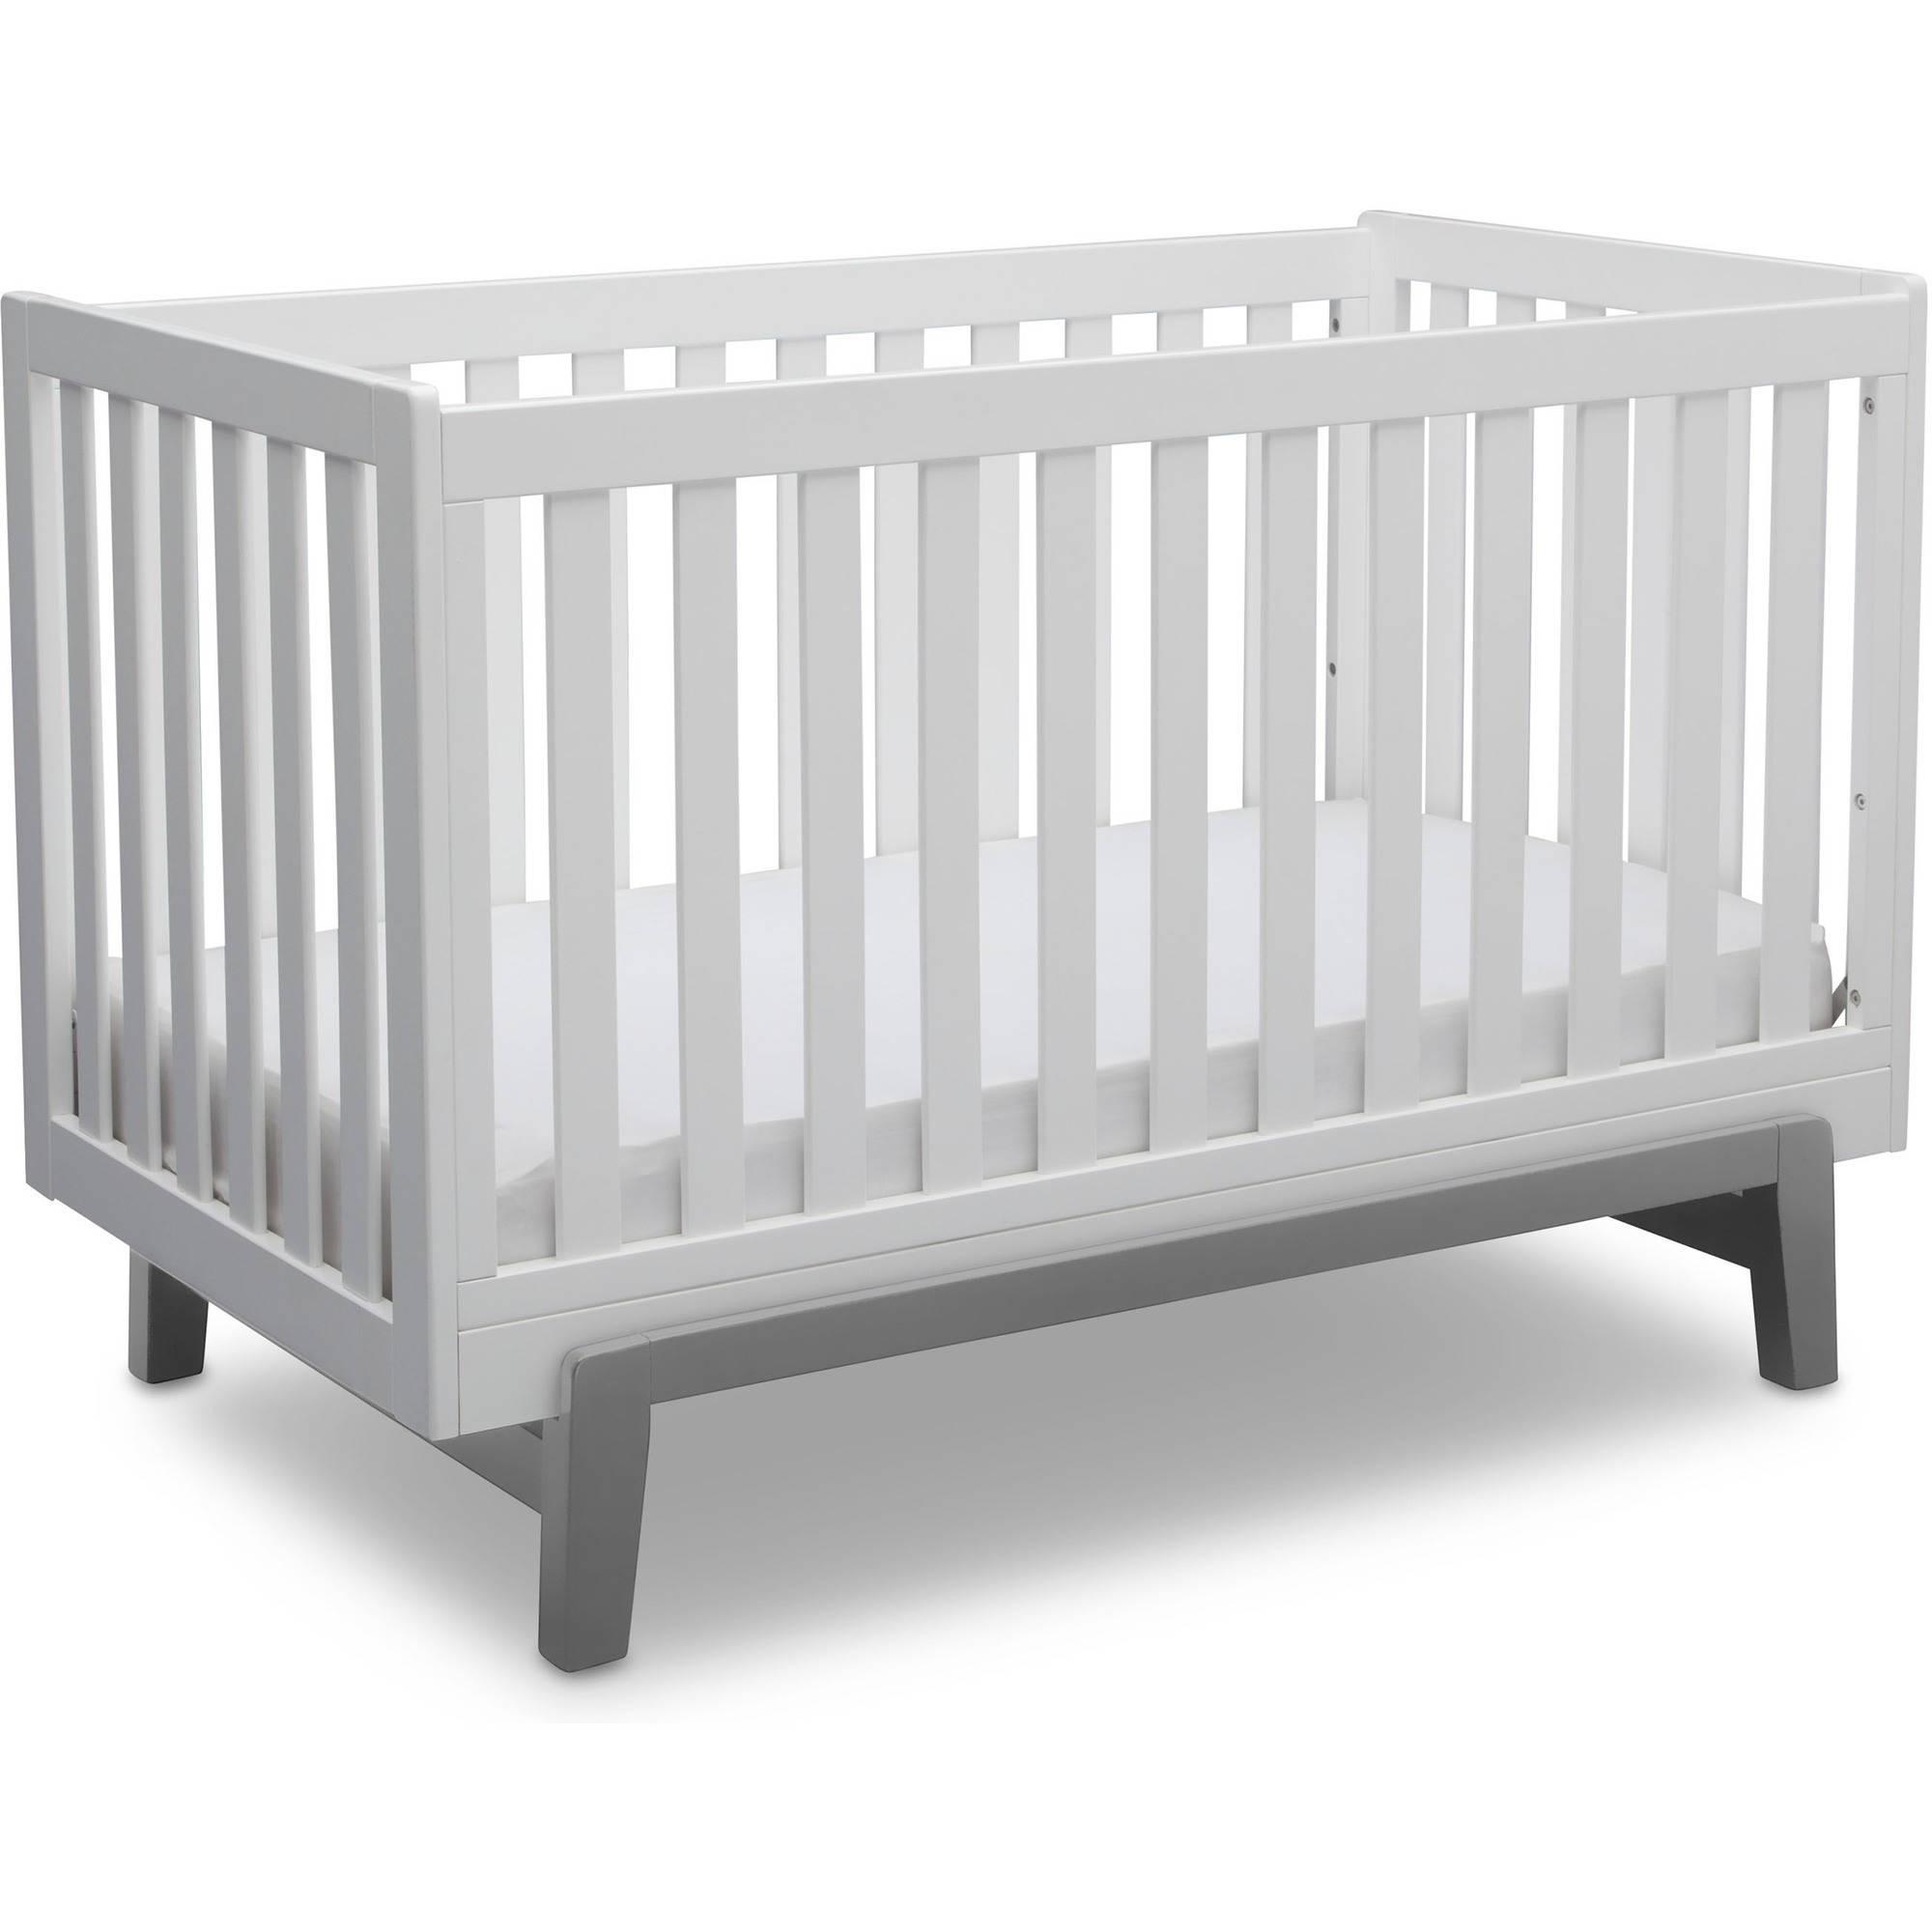 Delta Children Aster 3-in-1 Convertible Crib, Bianca White with Grey